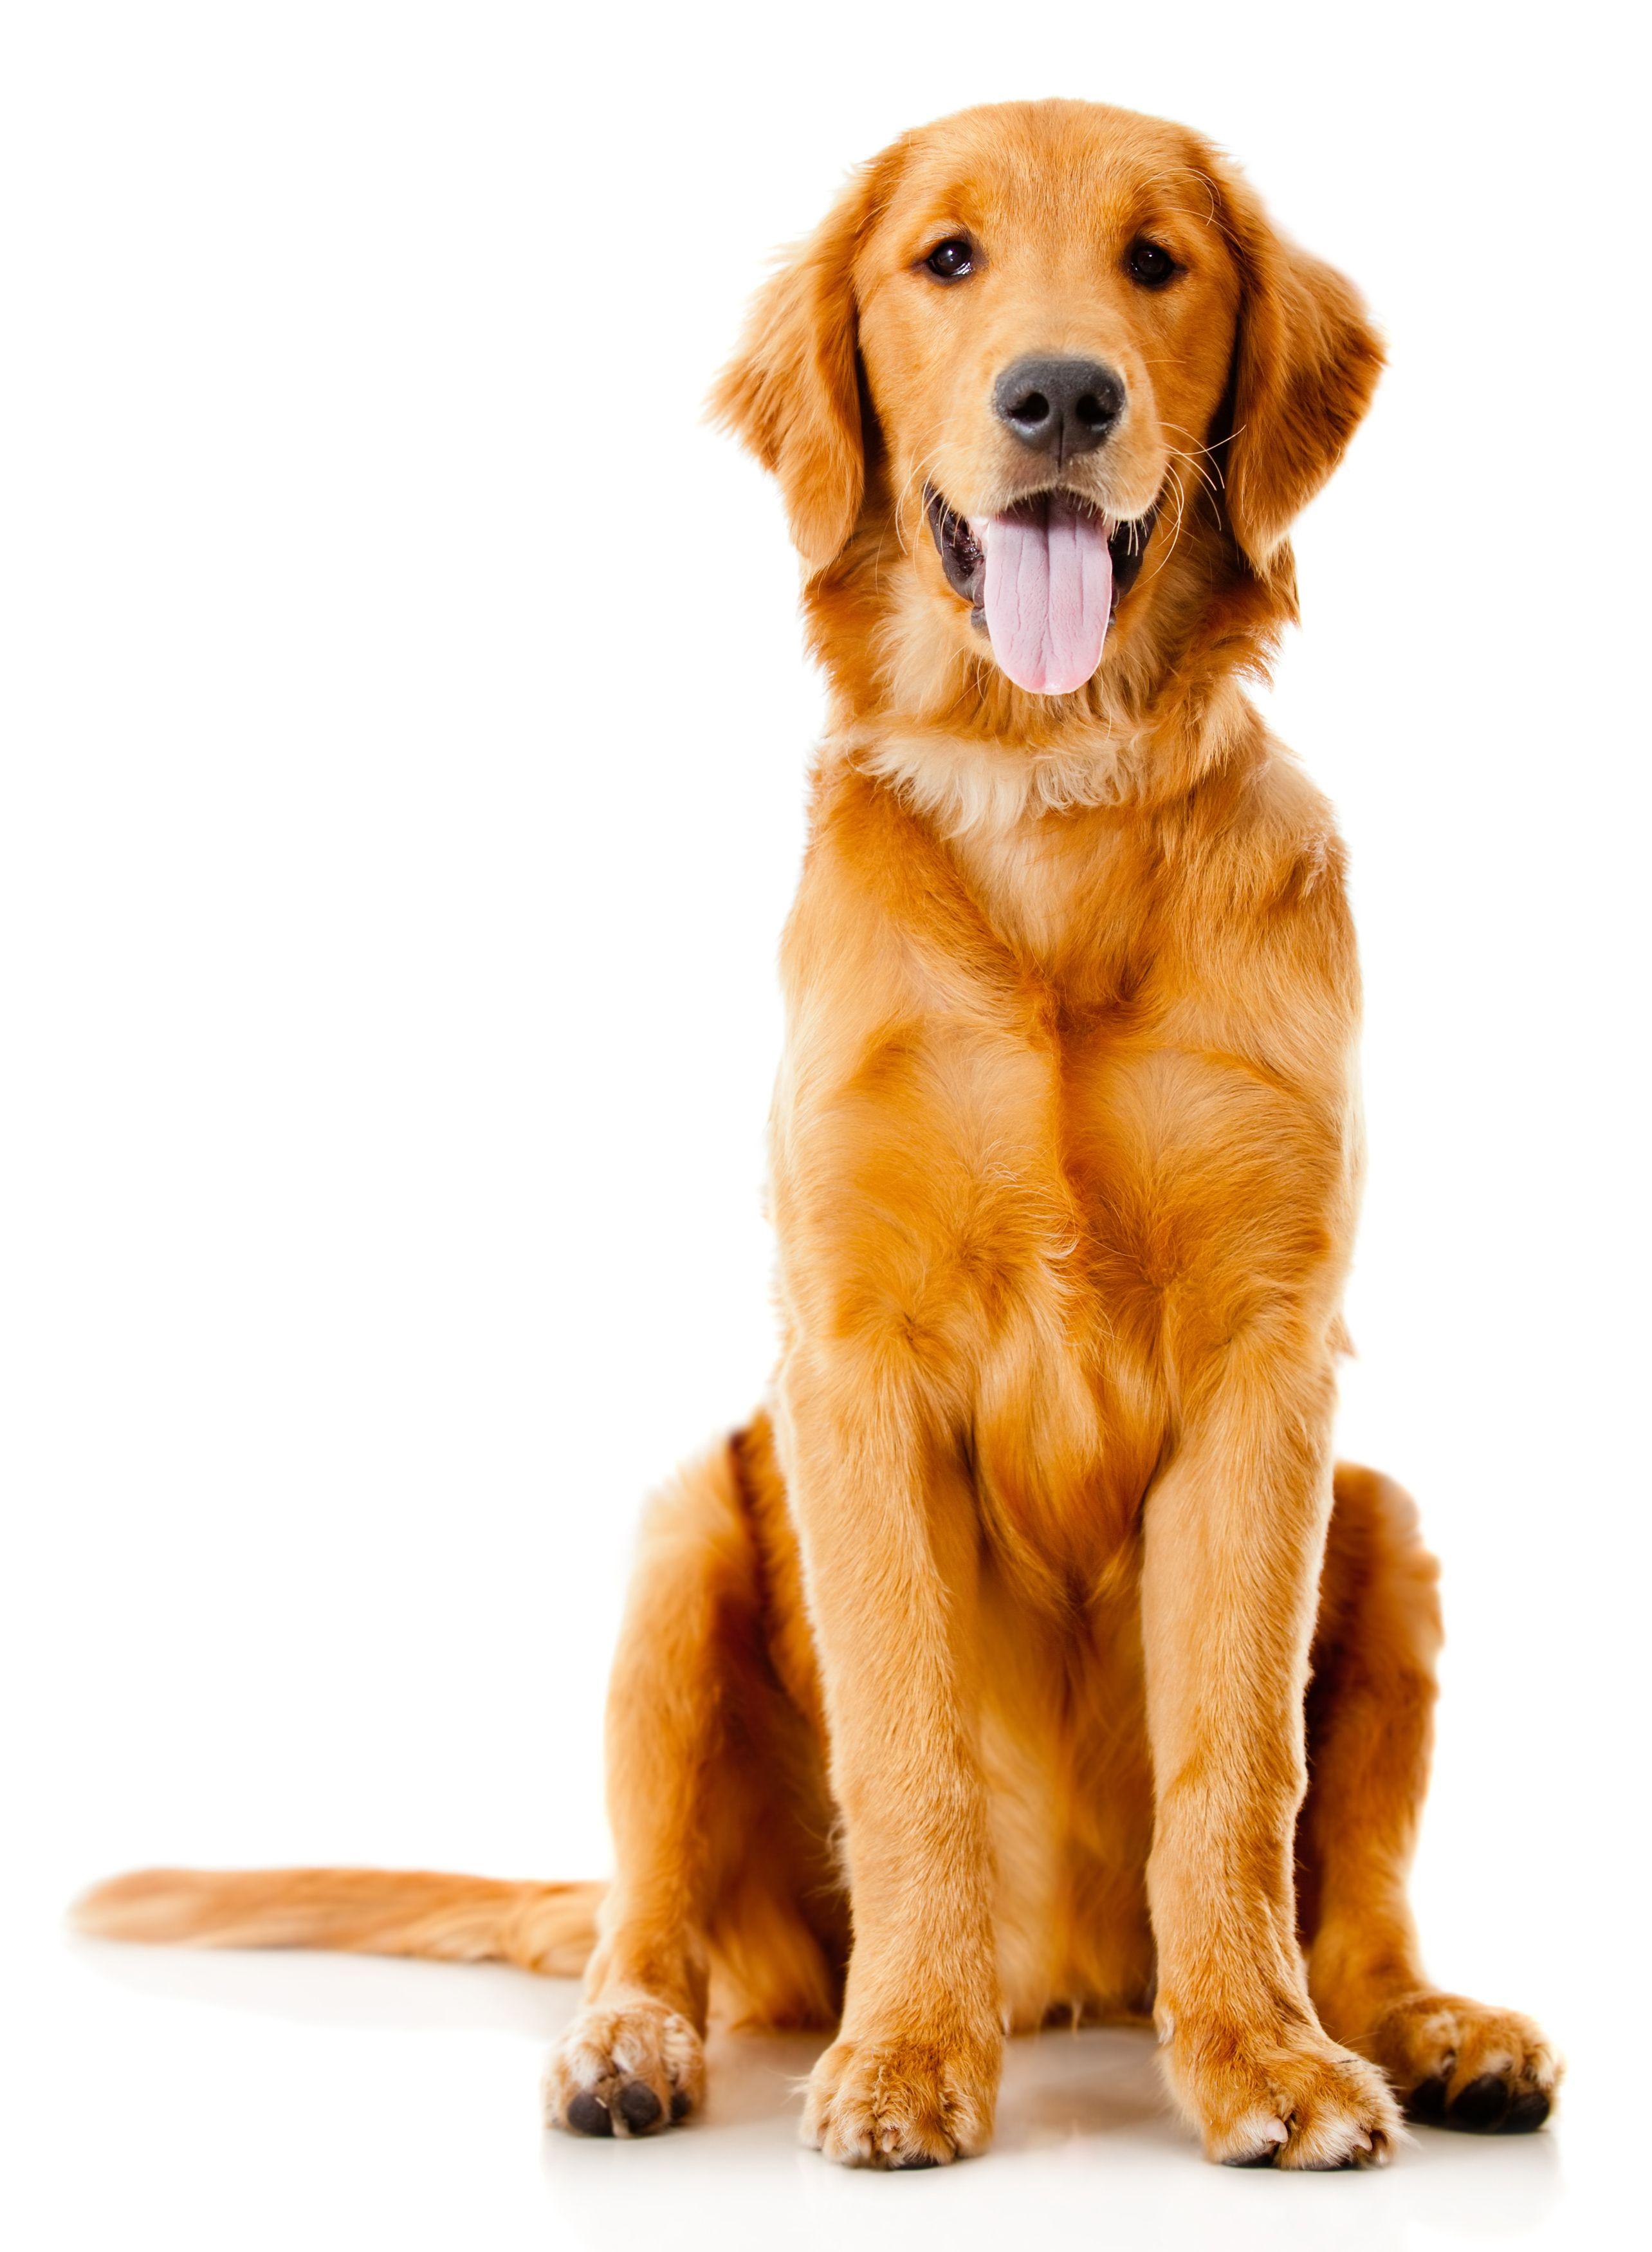 Madewitheditor Shutterstock Editor Pinterest Dogs Dog Bandana